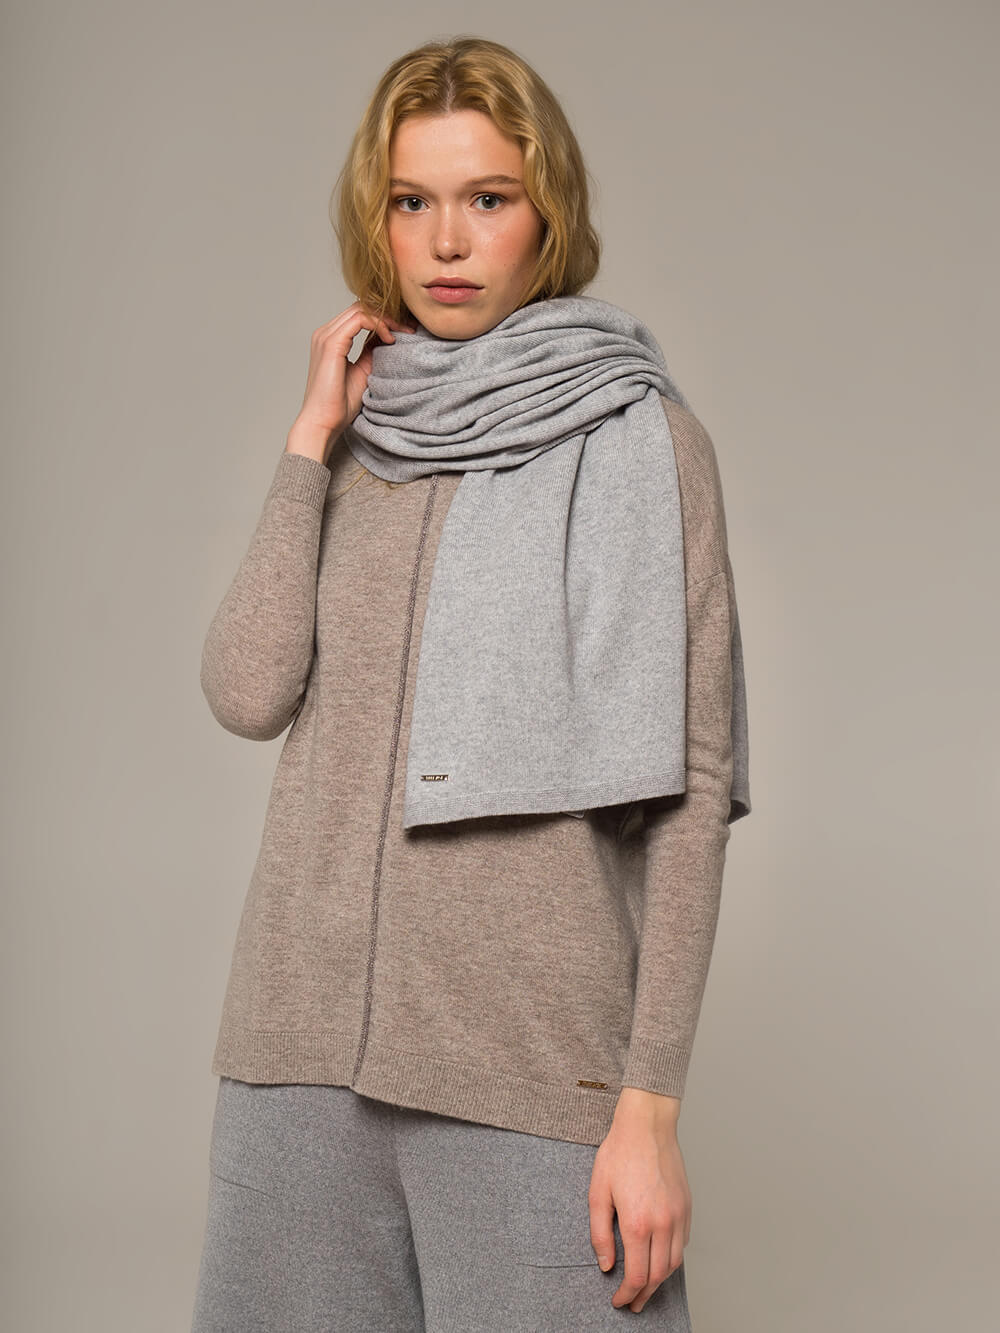 Женский шарф цвета серый меланж - фото 1